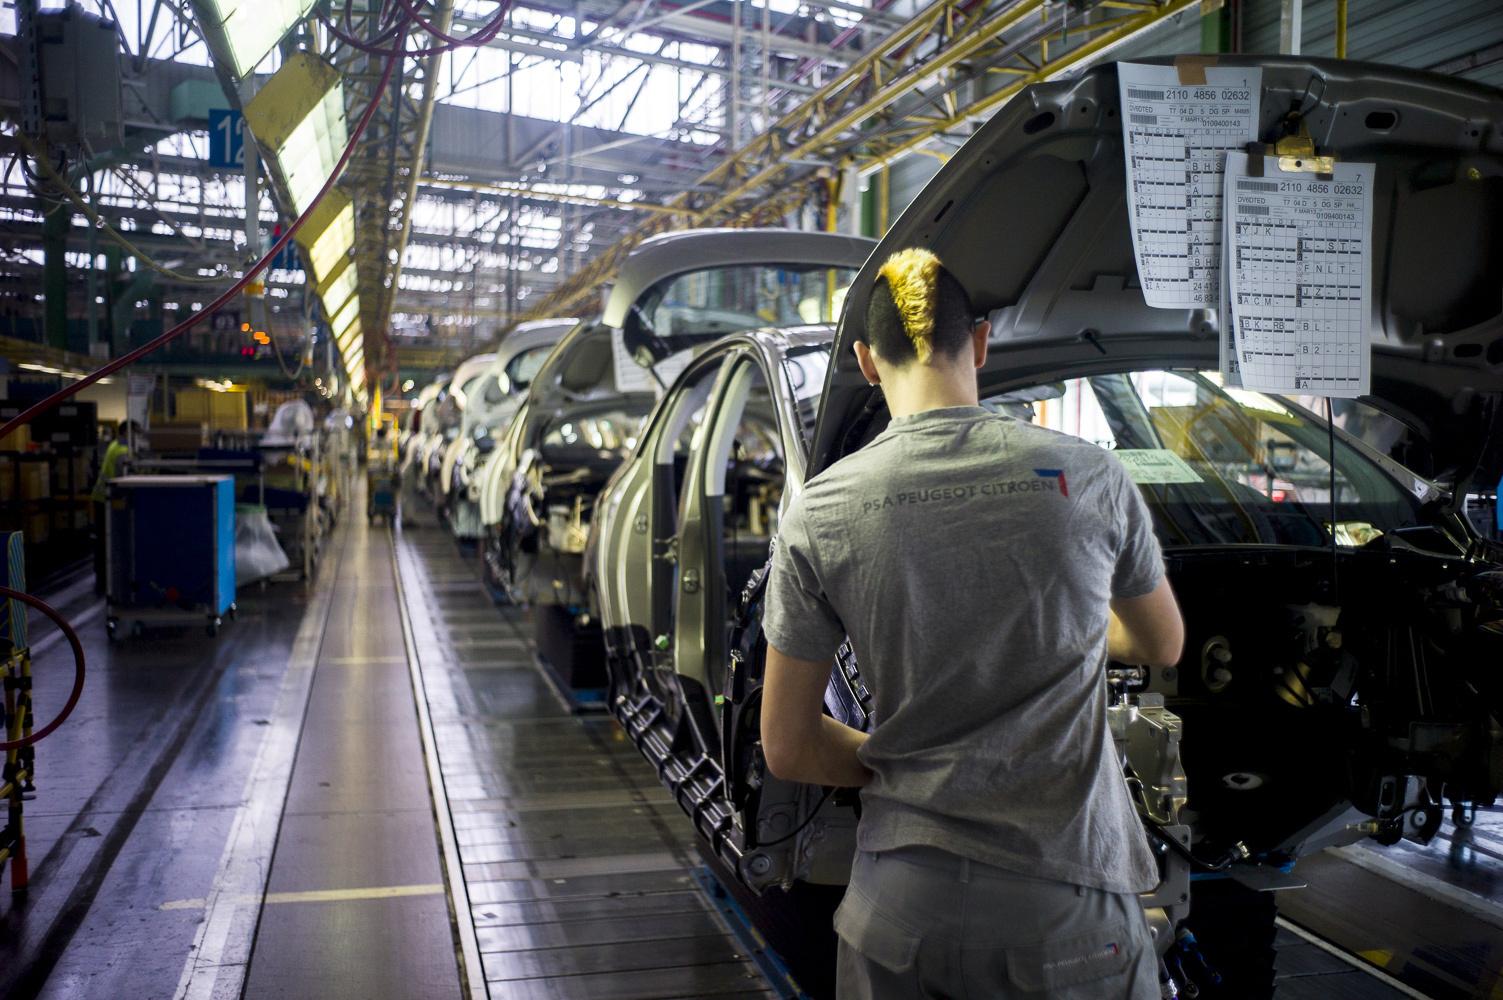 Работа на заводе конвейер физика задачи на движущуюся ленту транспортера